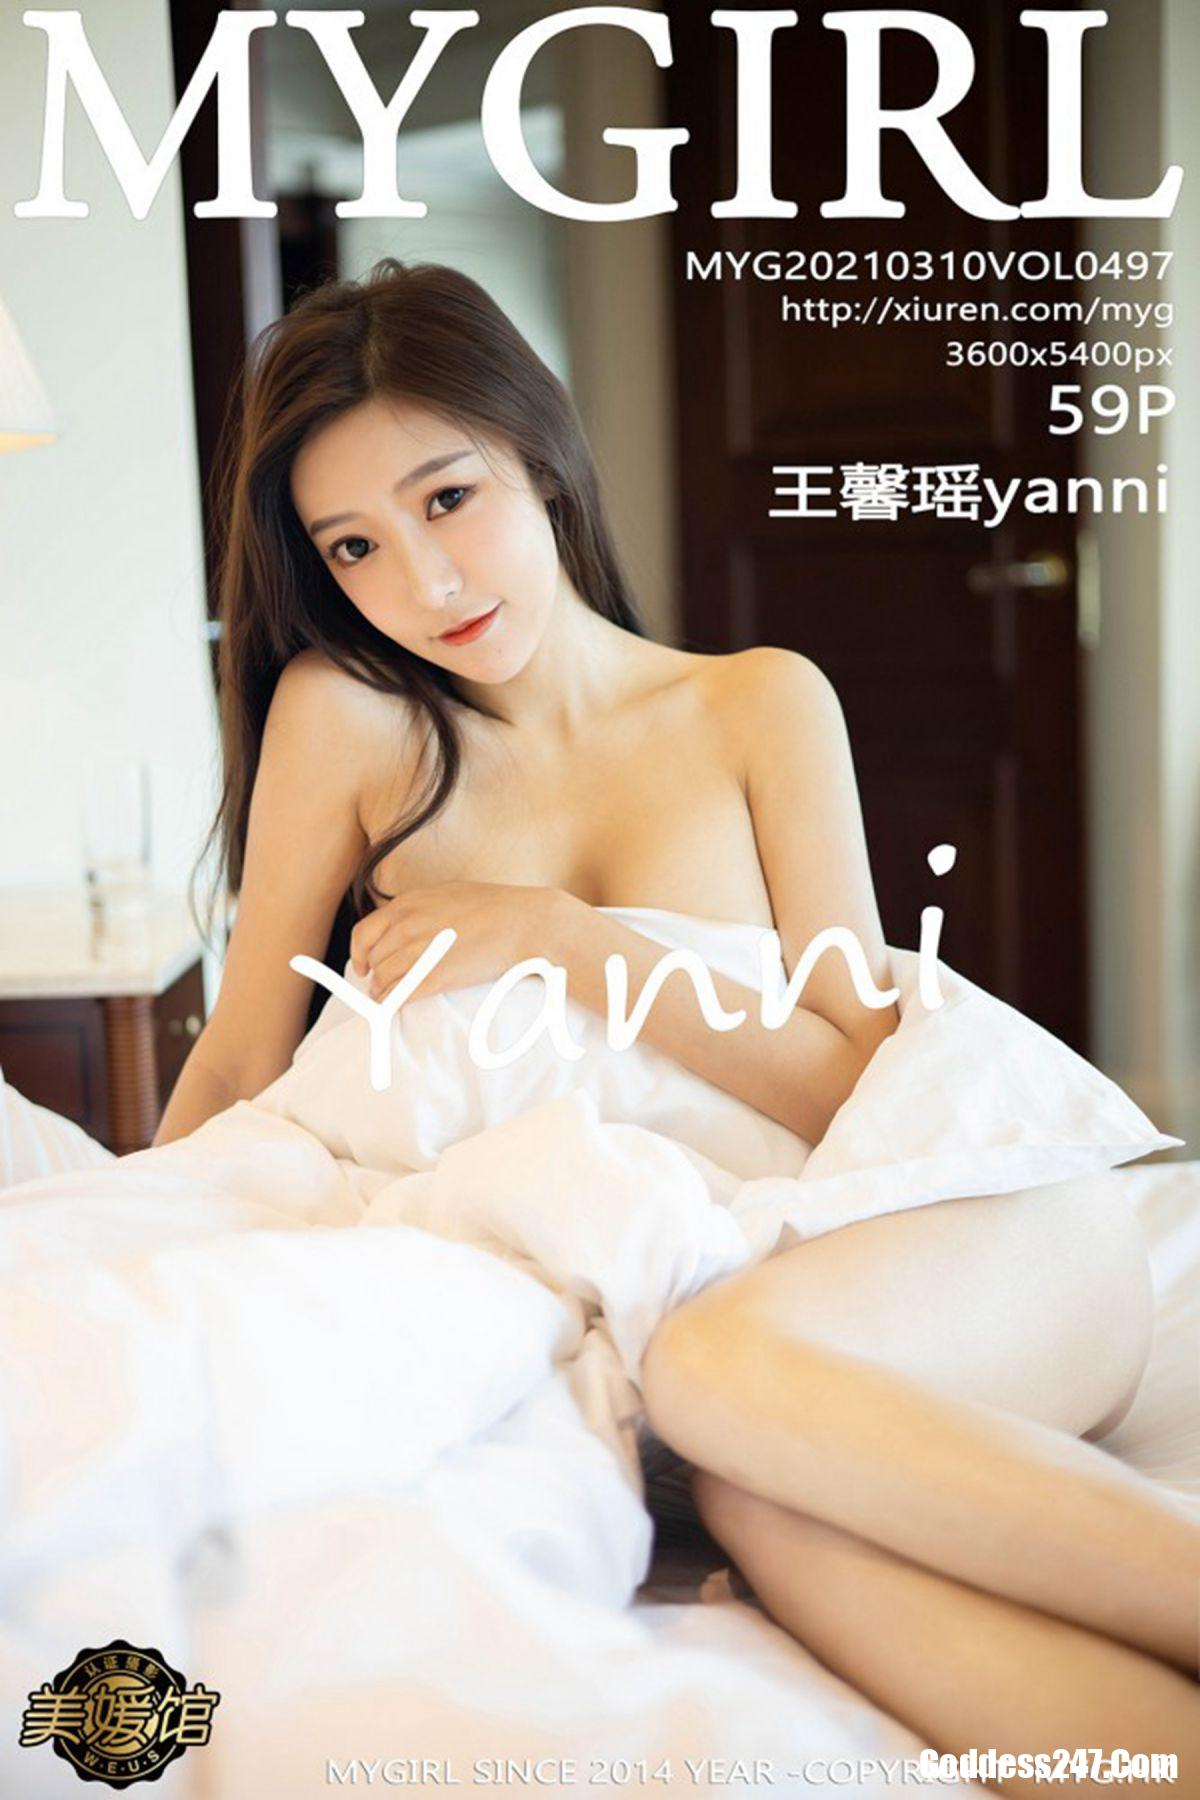 MyGirl美媛馆 Vol.497 王馨瑶yanni